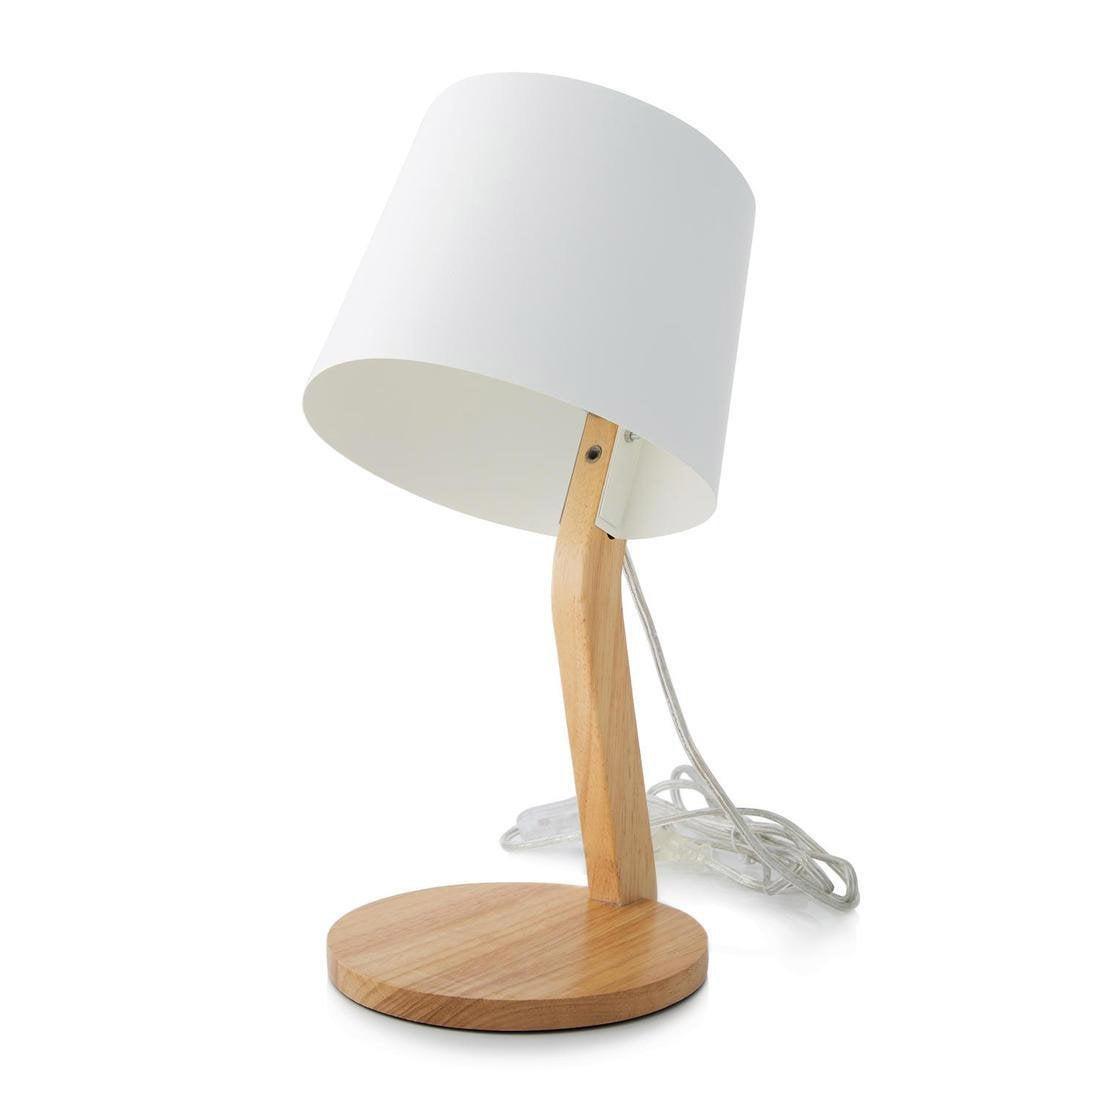 Lampe, g9 Woody, métal blanc, 28 W